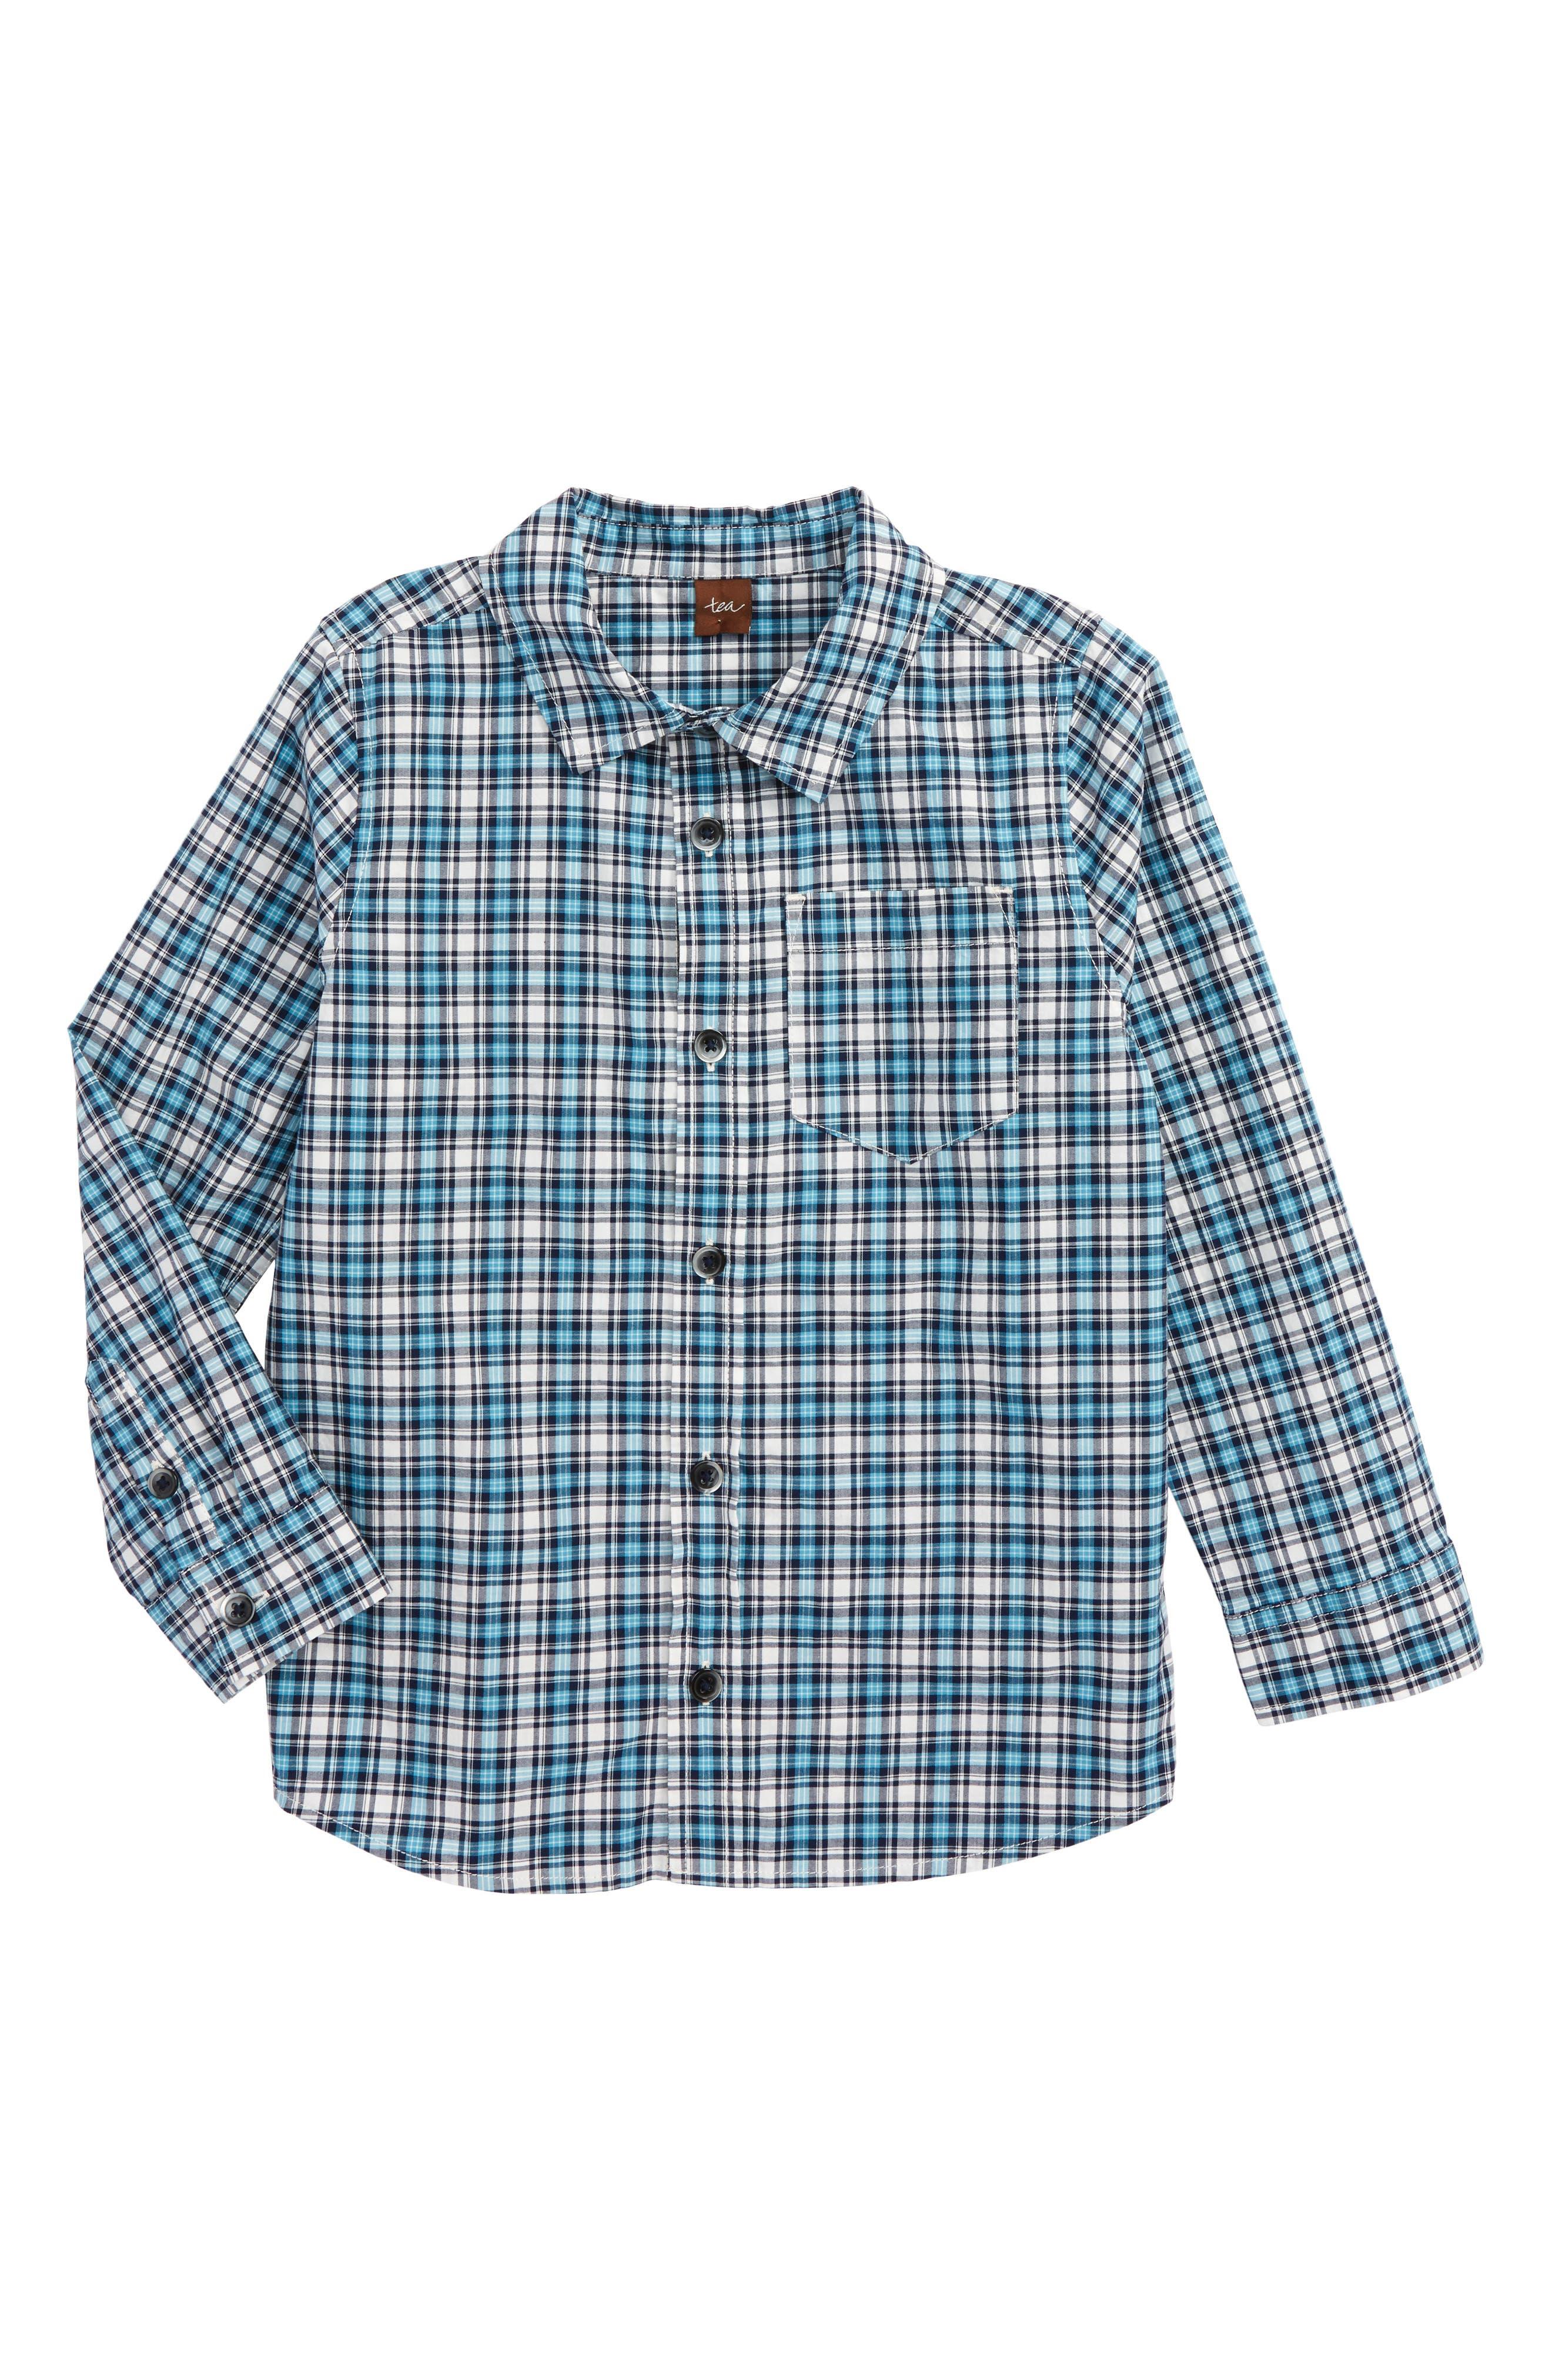 Heath Plaid Woven Shirt,                         Main,                         color, 103